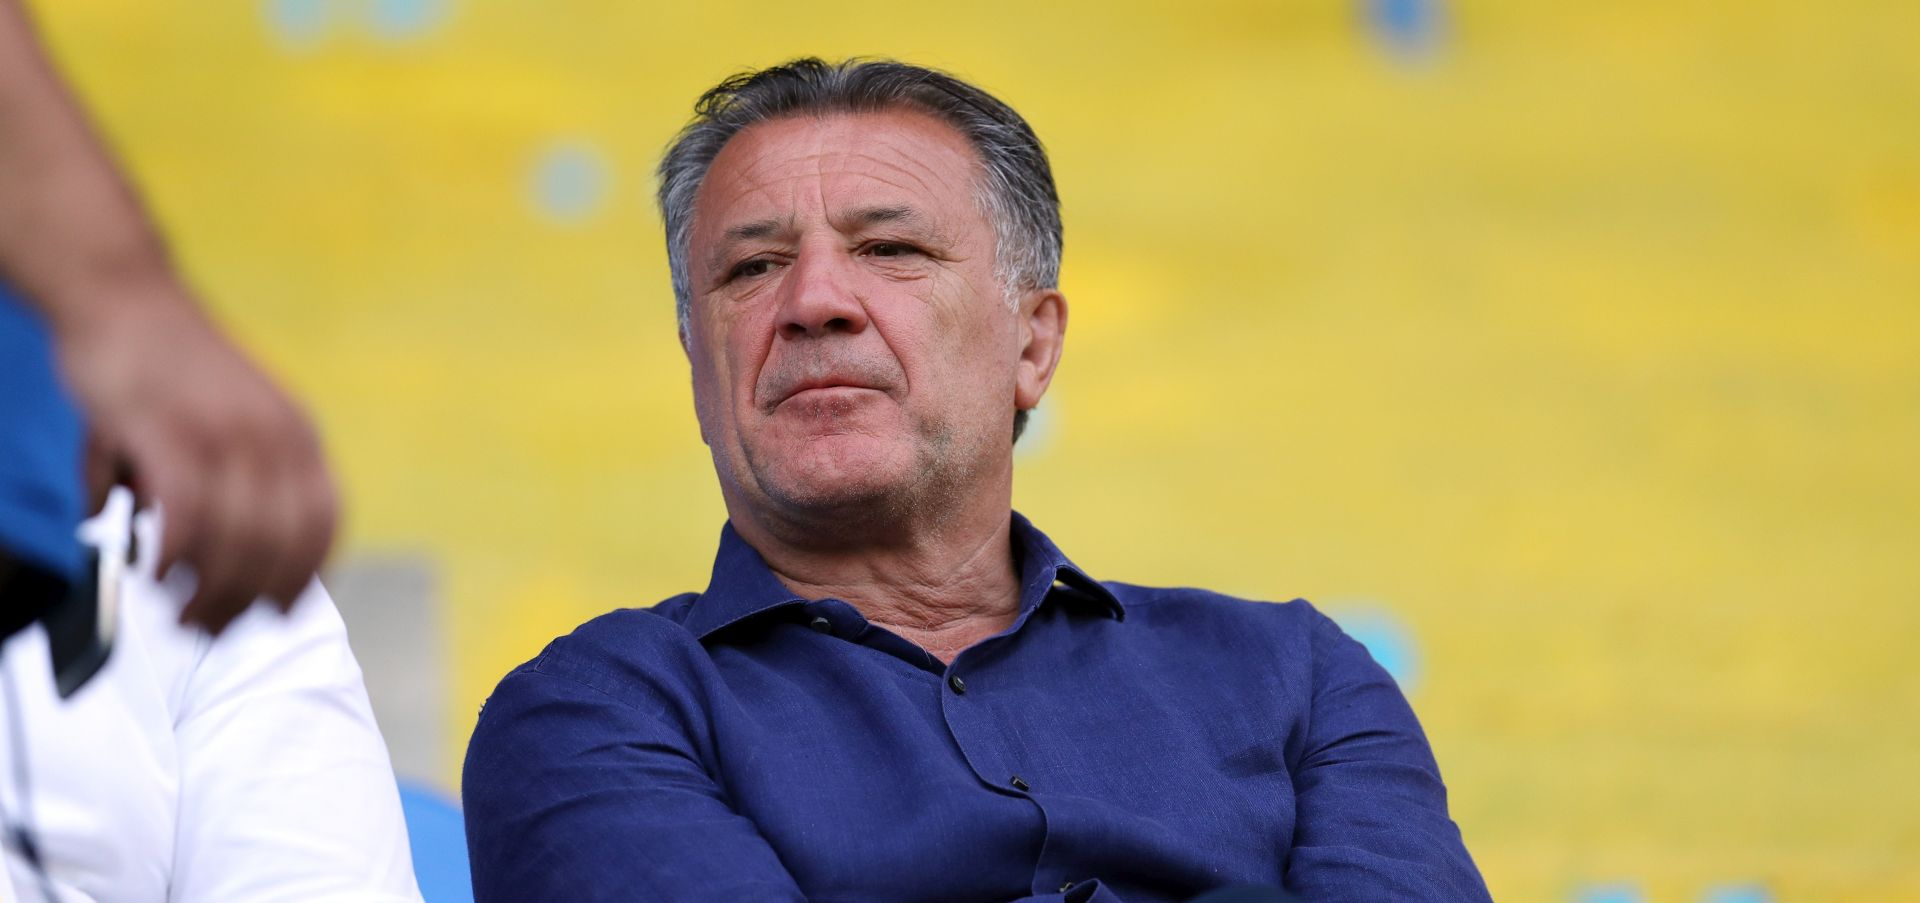 ODBIO IĆI U SPLIT Mamić nakon medicinske obrade otišao za Zagreb